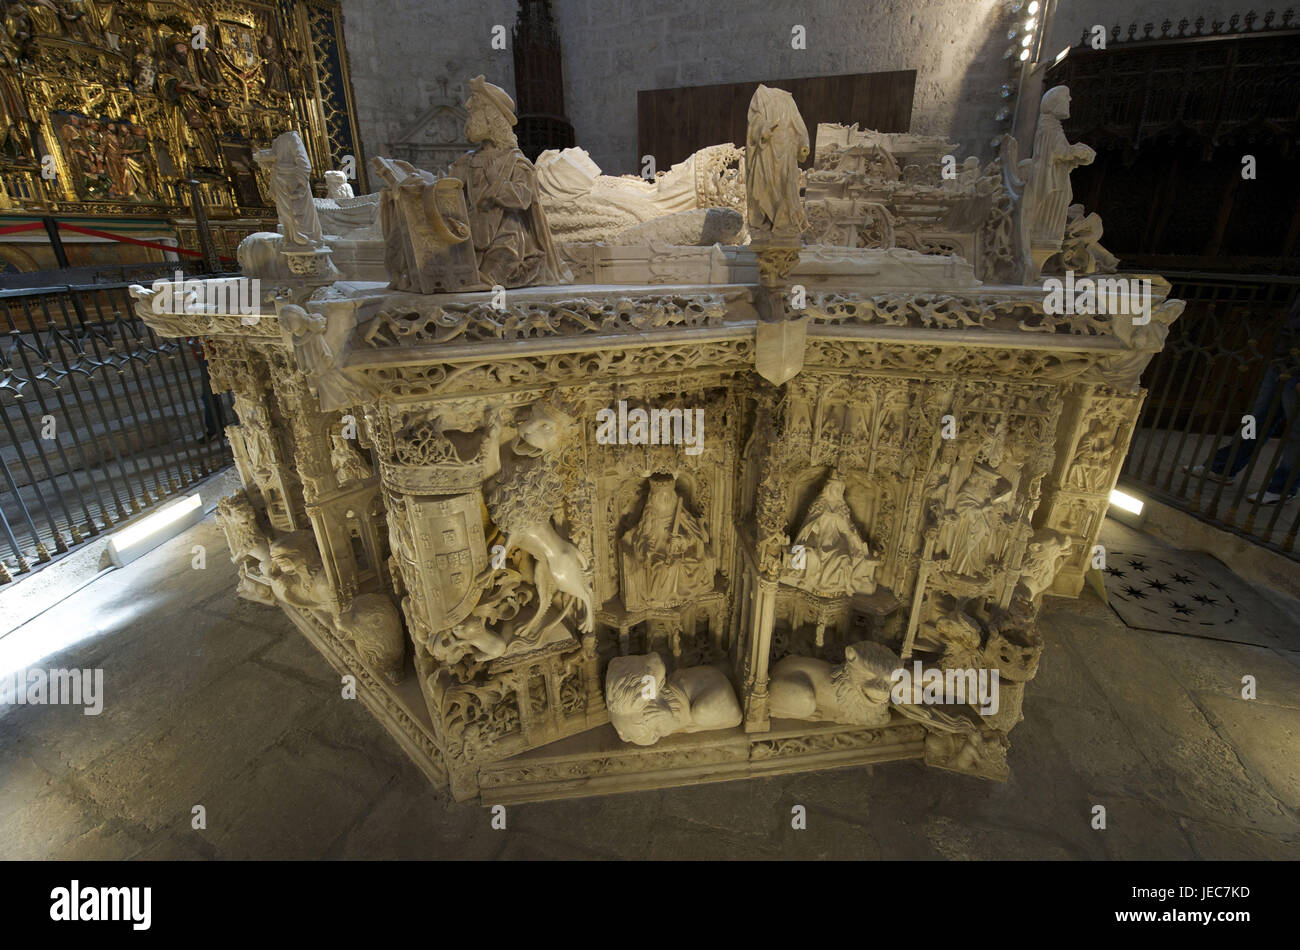 Spain, Castile and Leon, Burgos, Carthusian monastery, Cartuja de Miraflores, mausoleum, Stock Photo